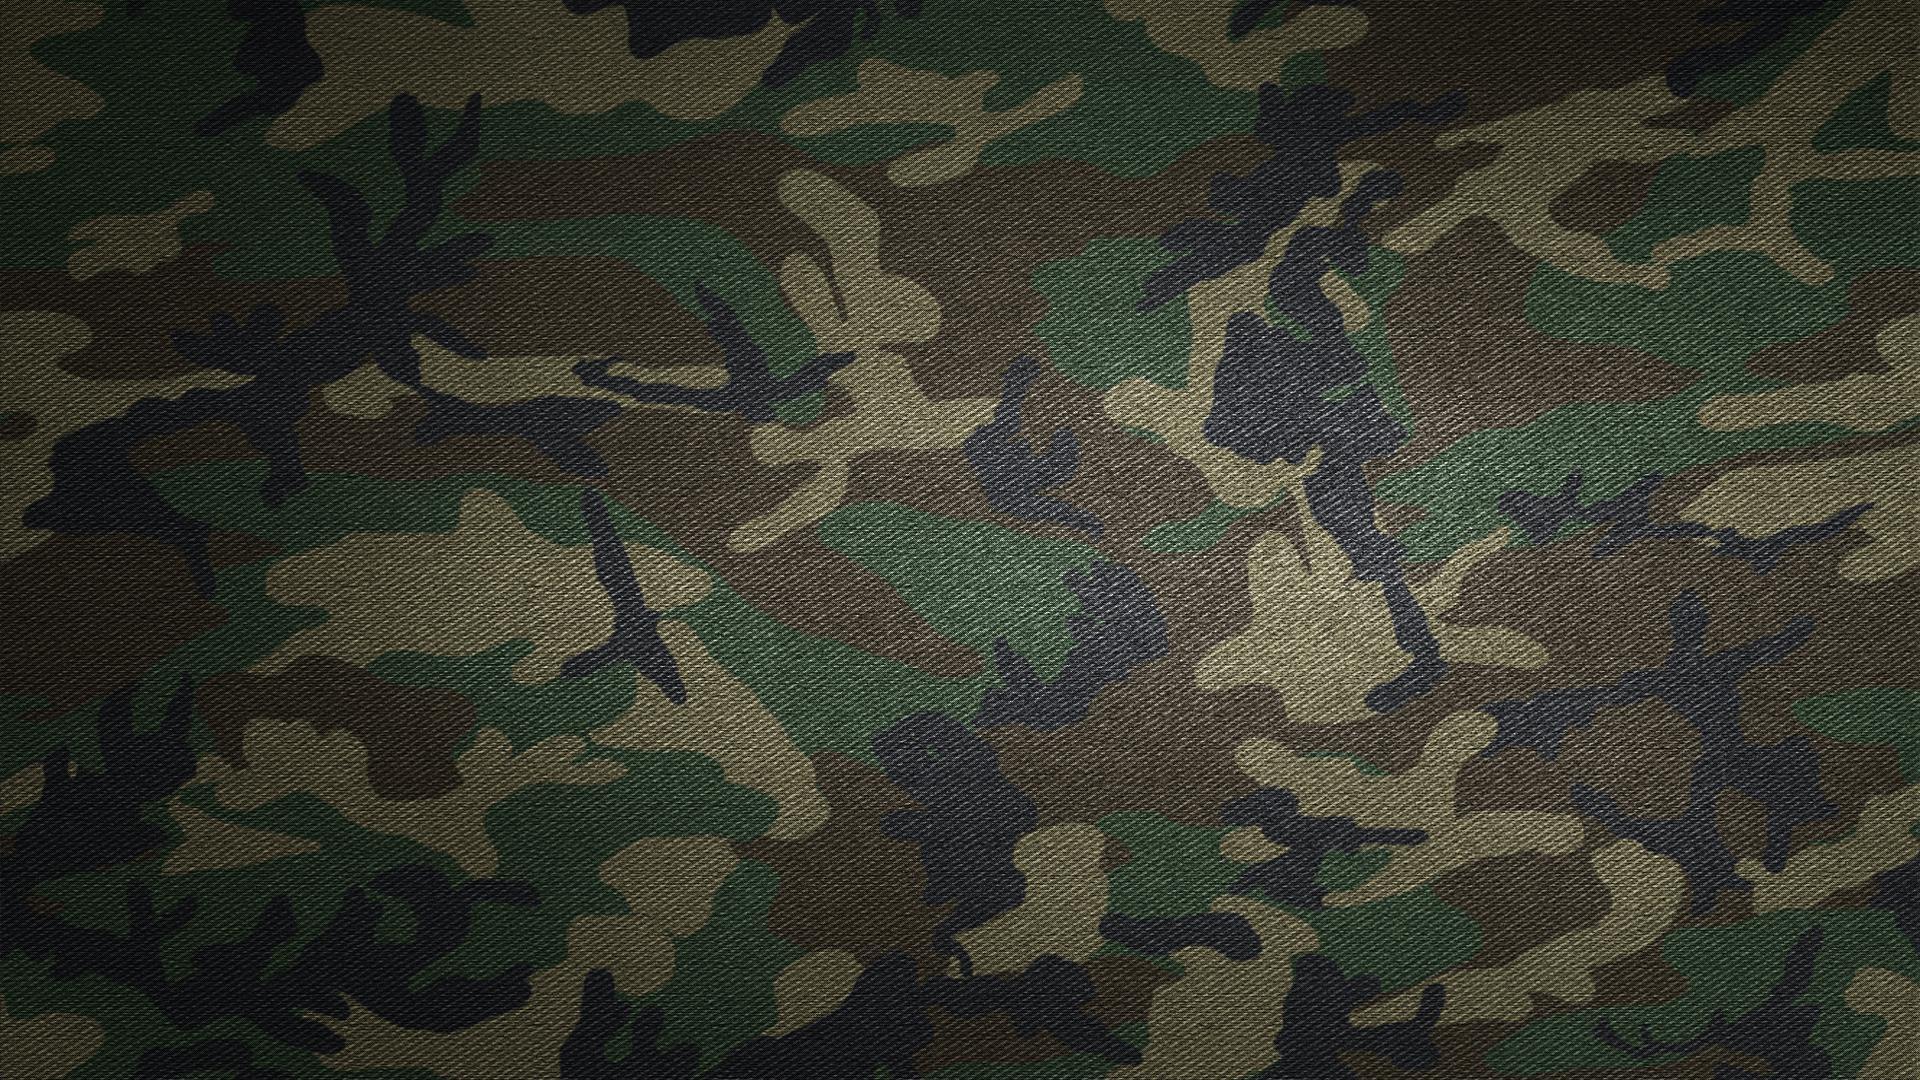 Camo Desktop Wallpapers   Data-src /full/387476 - Camouflage Hd - HD Wallpaper